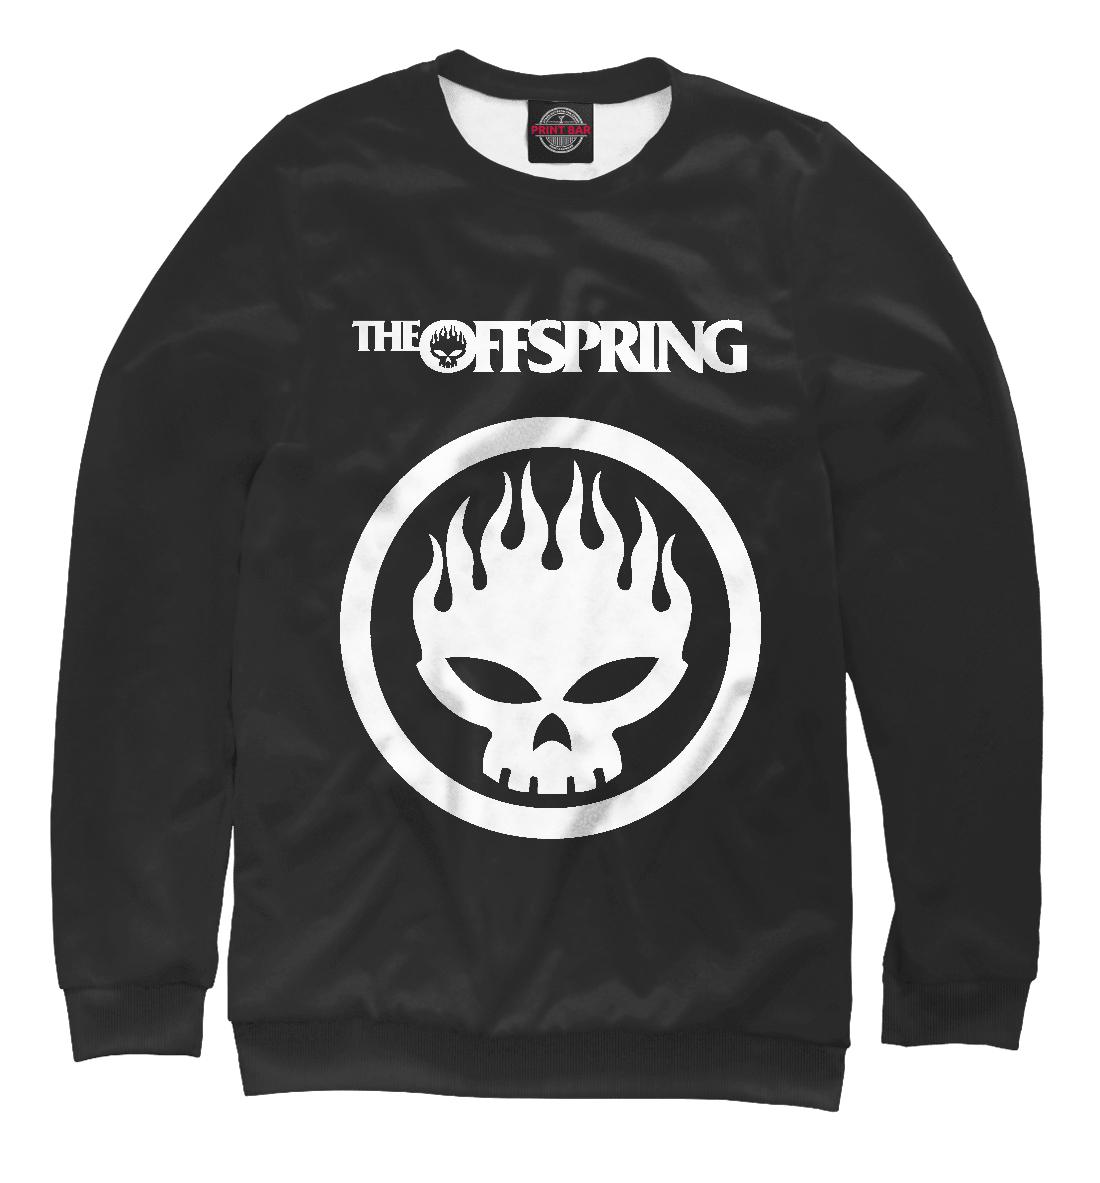 Купить The Offspring, Printbar, Свитшоты, OFS-874935-swi-2